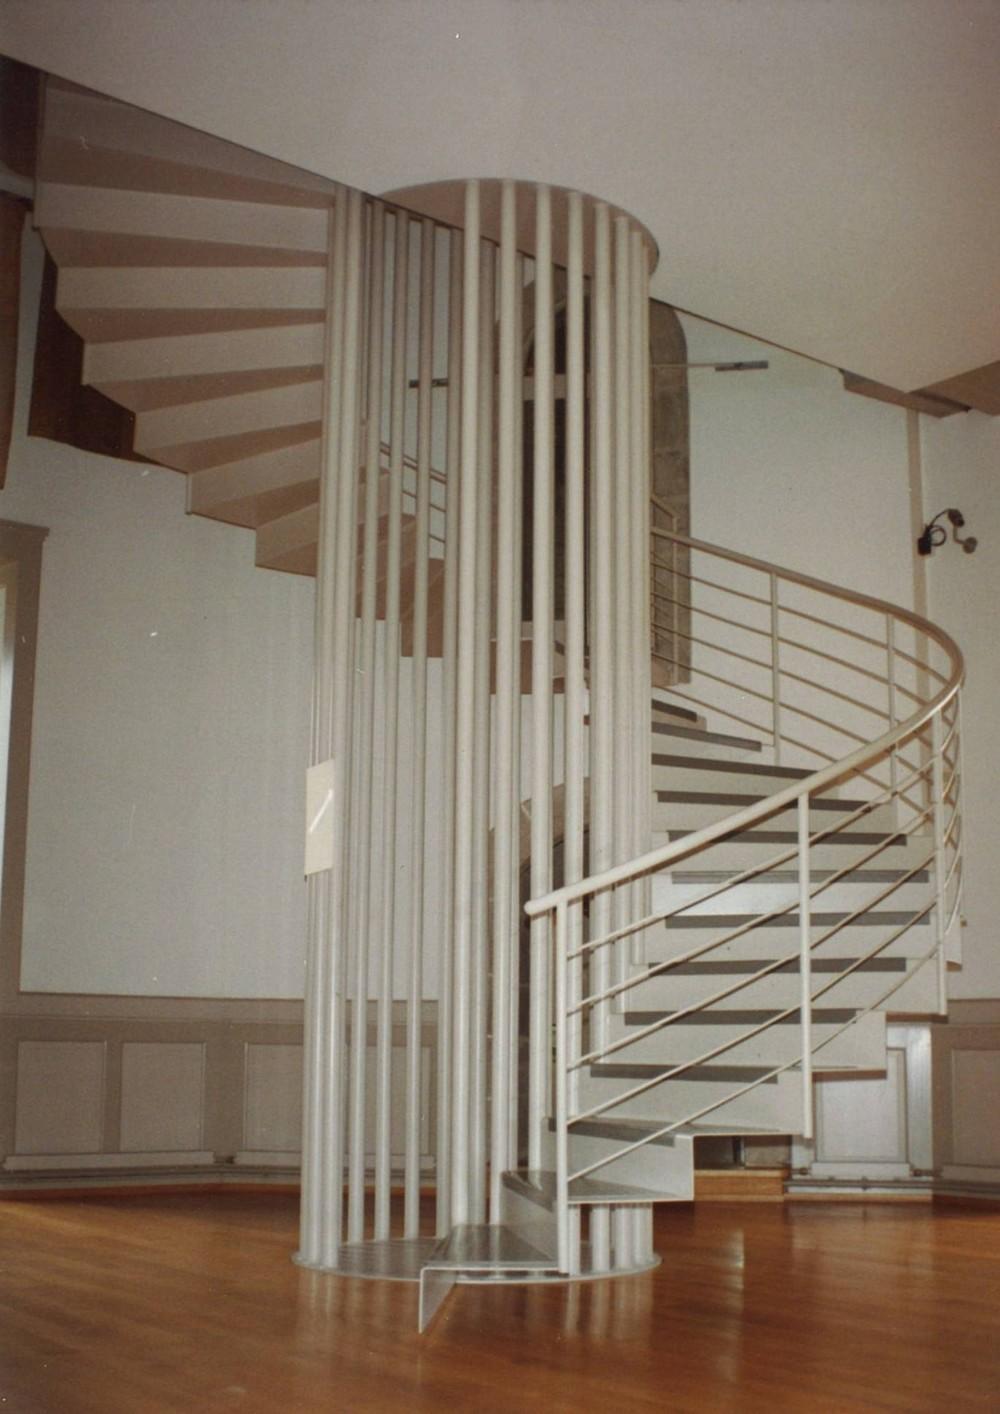 Escalier-tournant-2